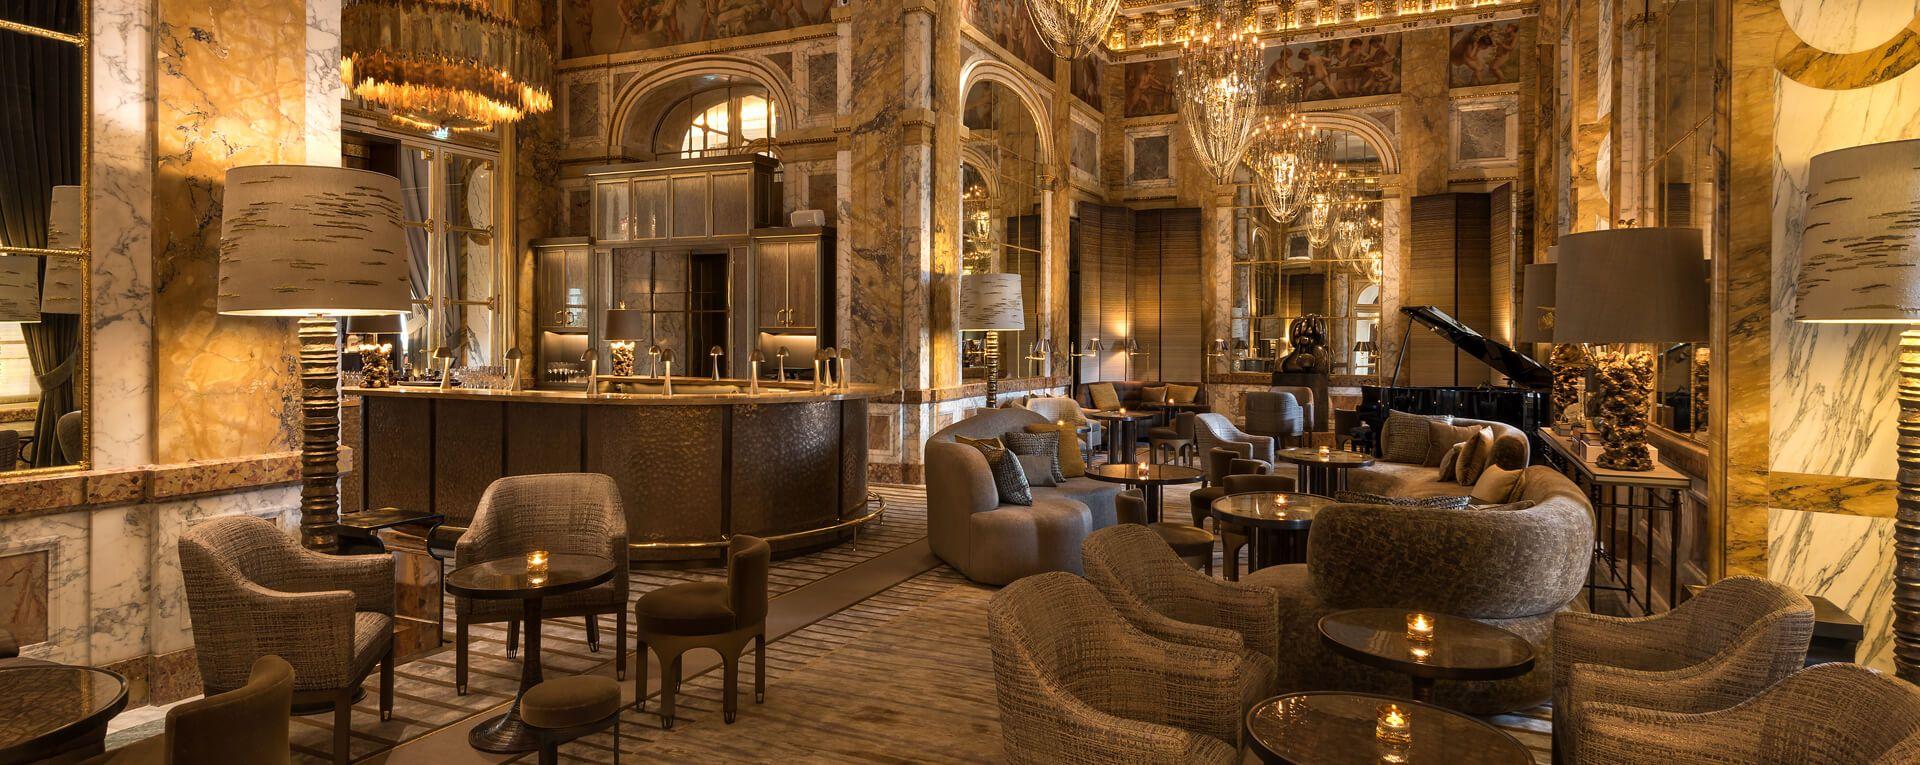 Hotel De Crillon, A Rosewood Hotel